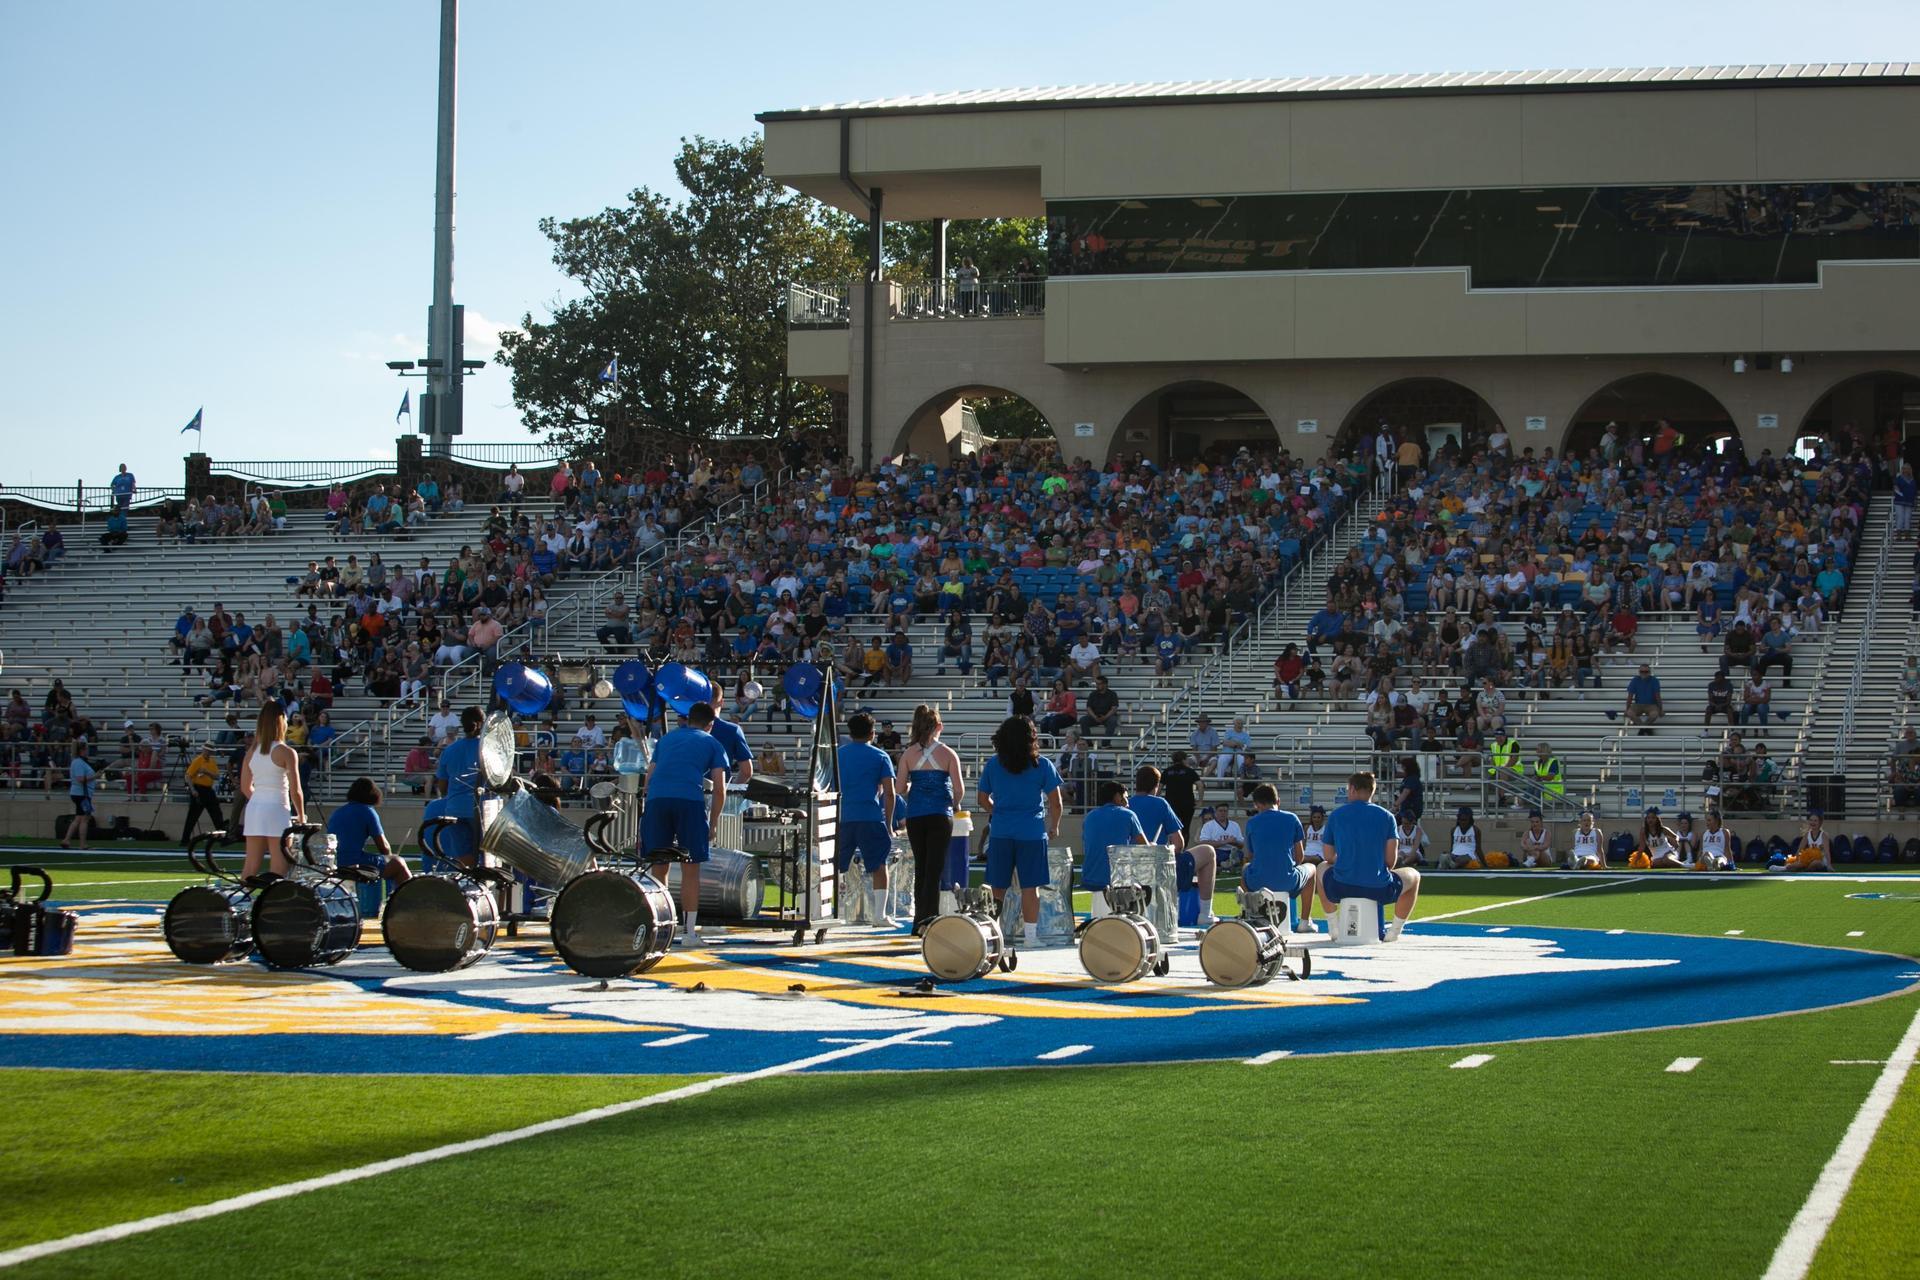 High School Band Street Drumline